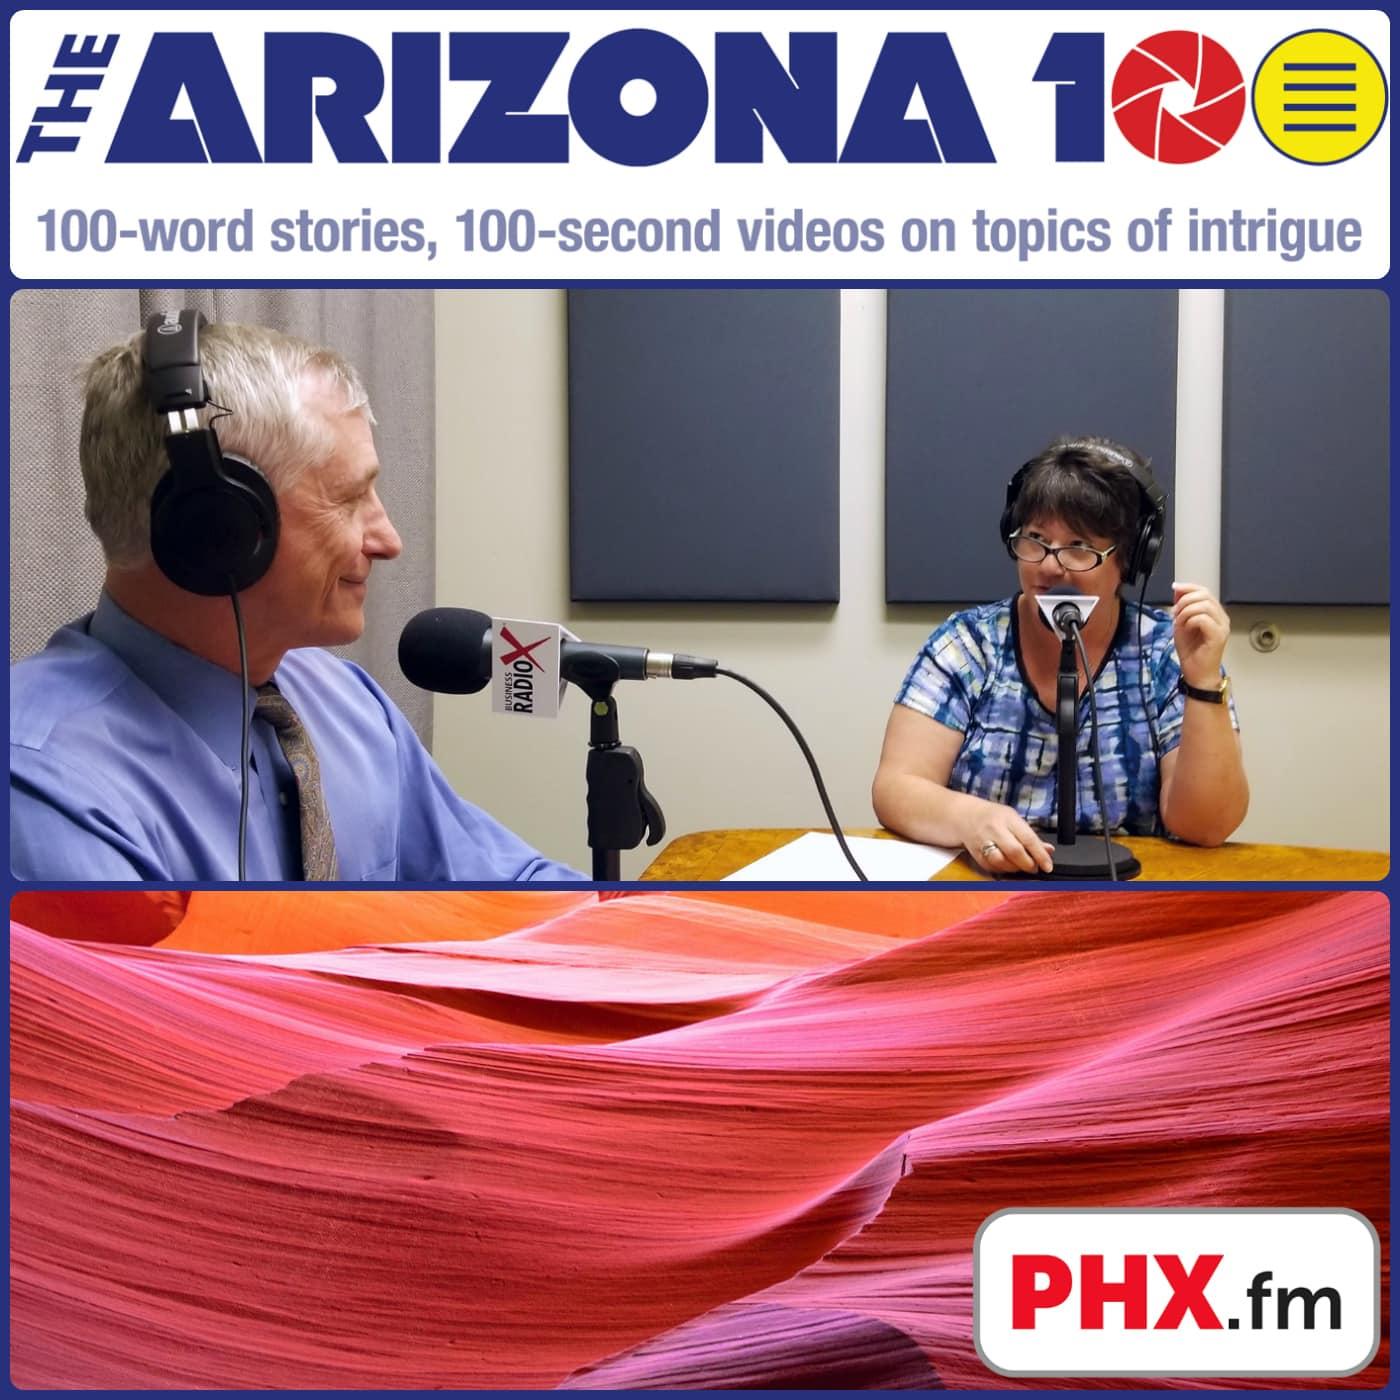 Artwork for podcast The Arizona 100